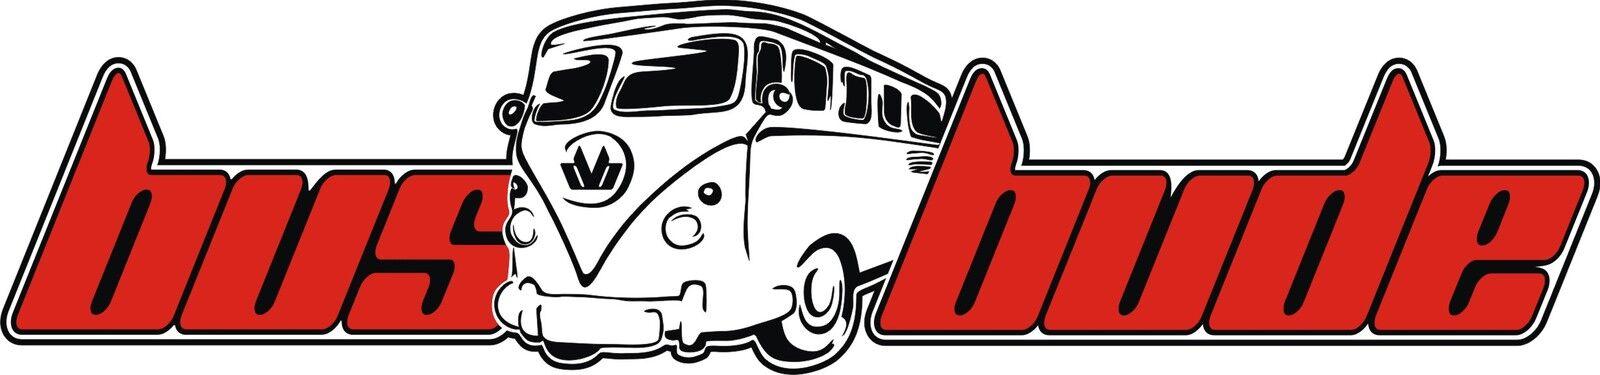 Busbude